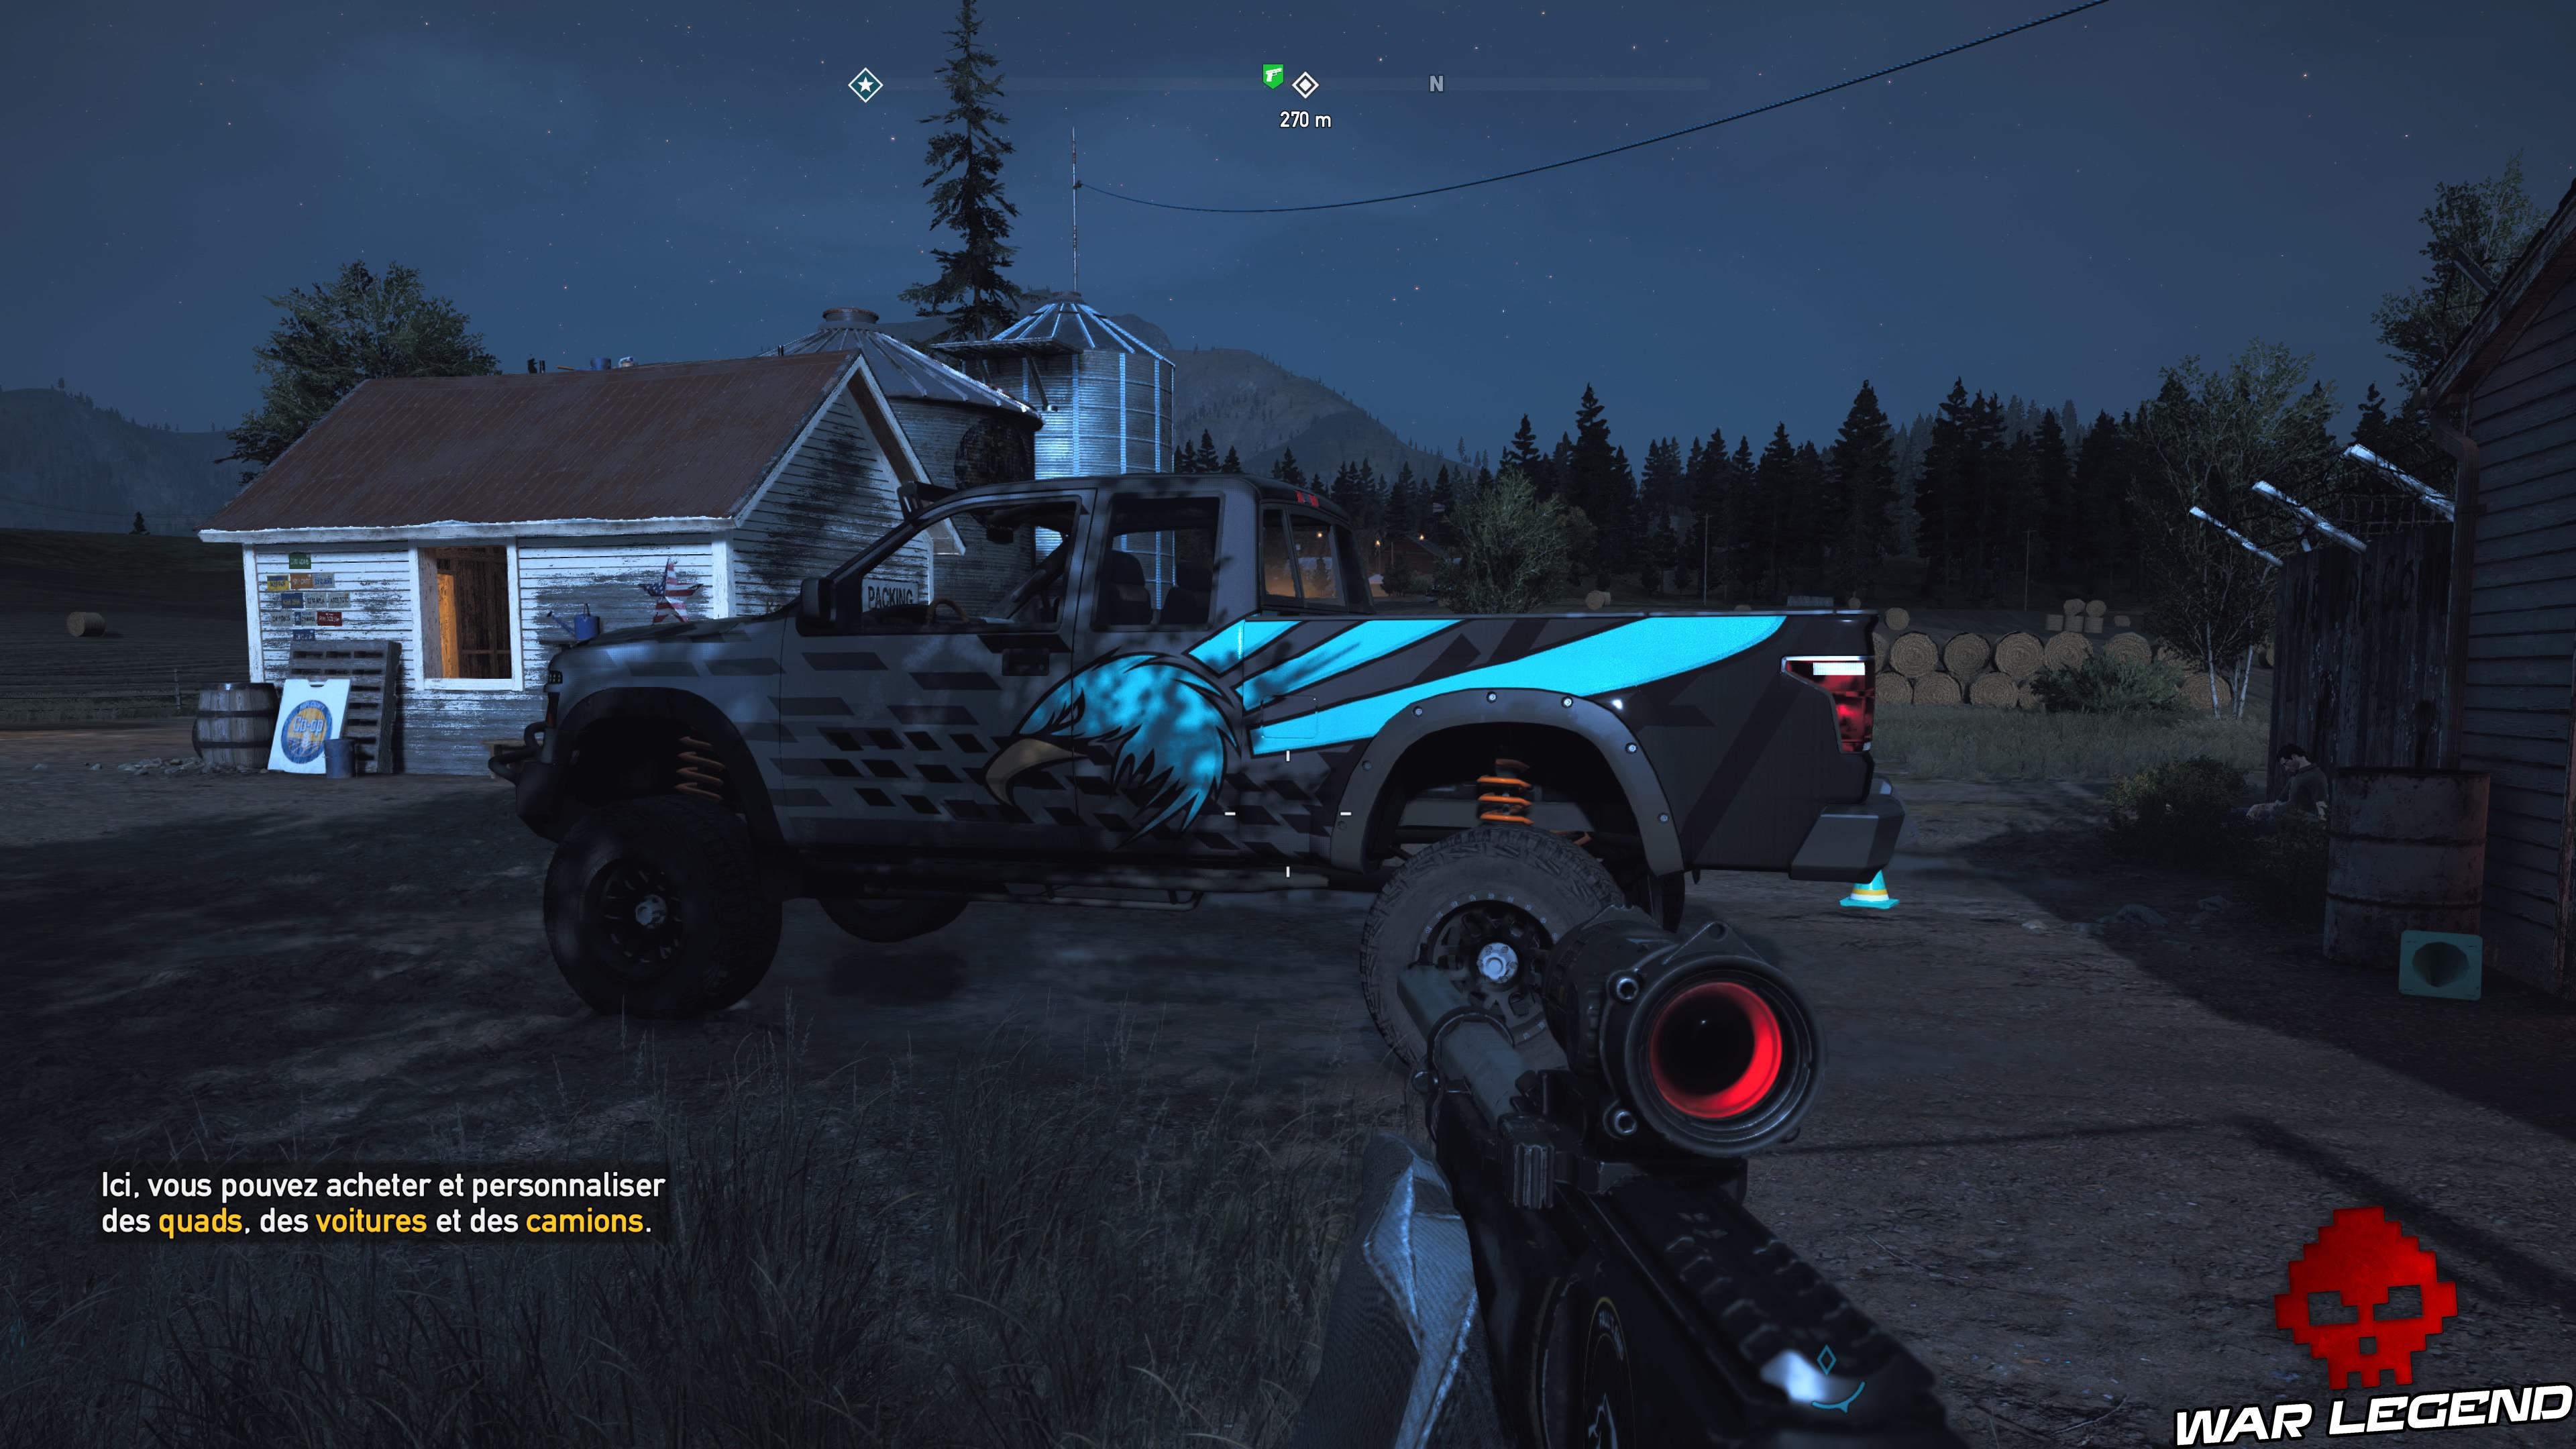 Guide Far Cry 5 caches survivalistes région de John kimberlite